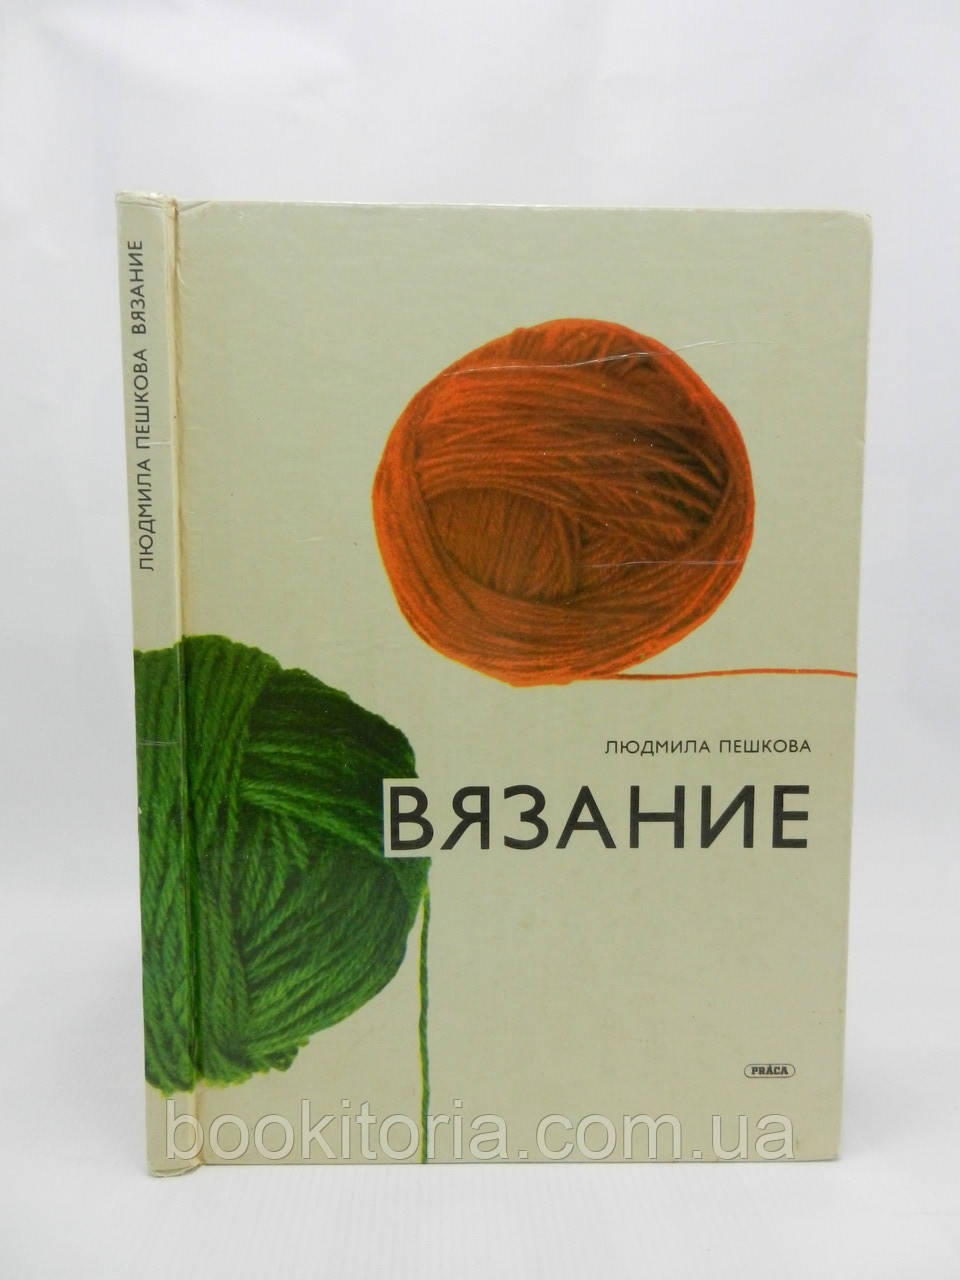 Пешкова Л. Вязание (б/у).